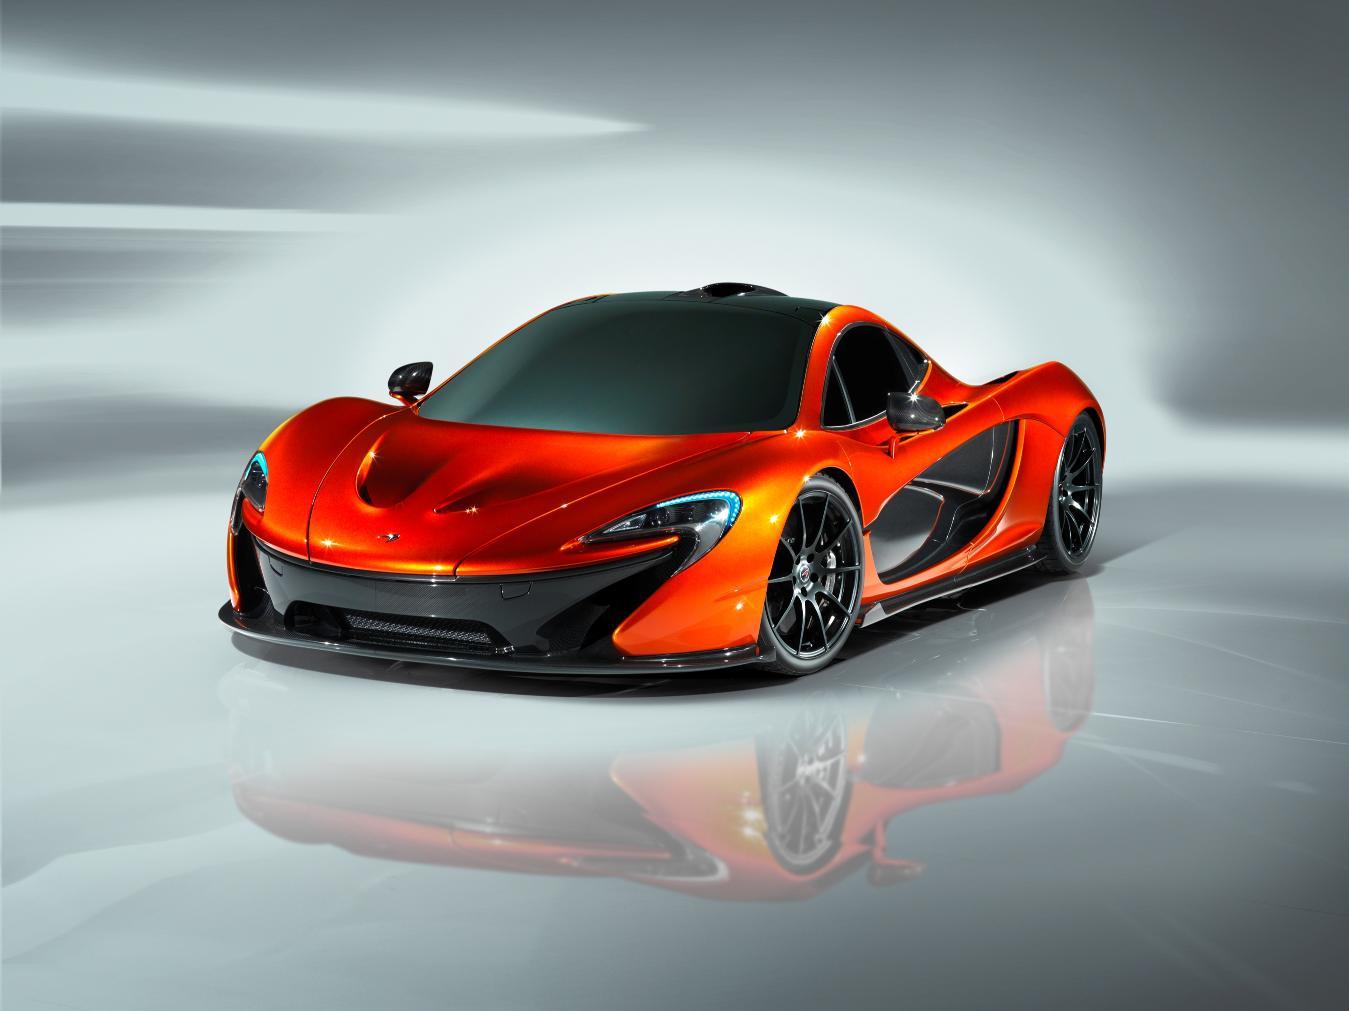 speedmonkey: mclaren p1 - photos and specs of the new supercar